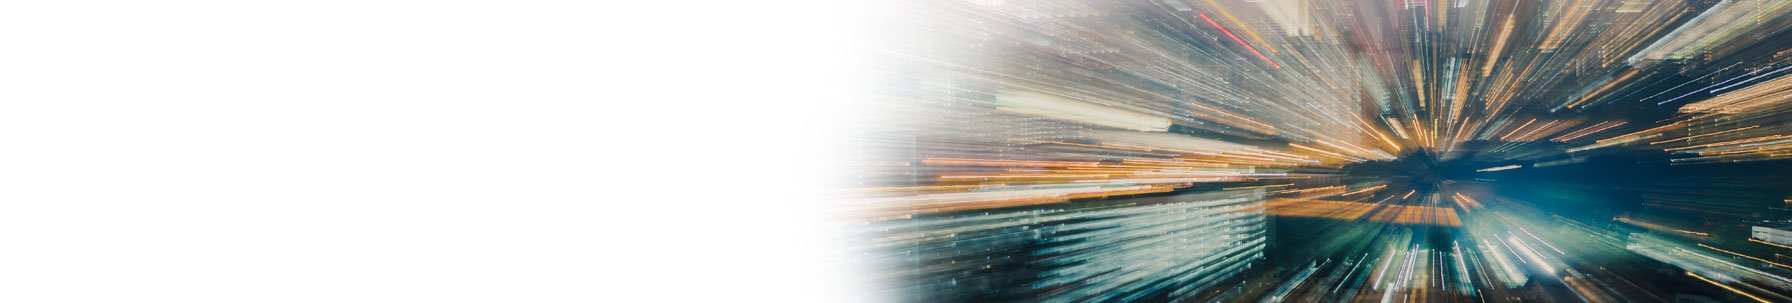 vcs-intelligent-workforce-management-blog-300